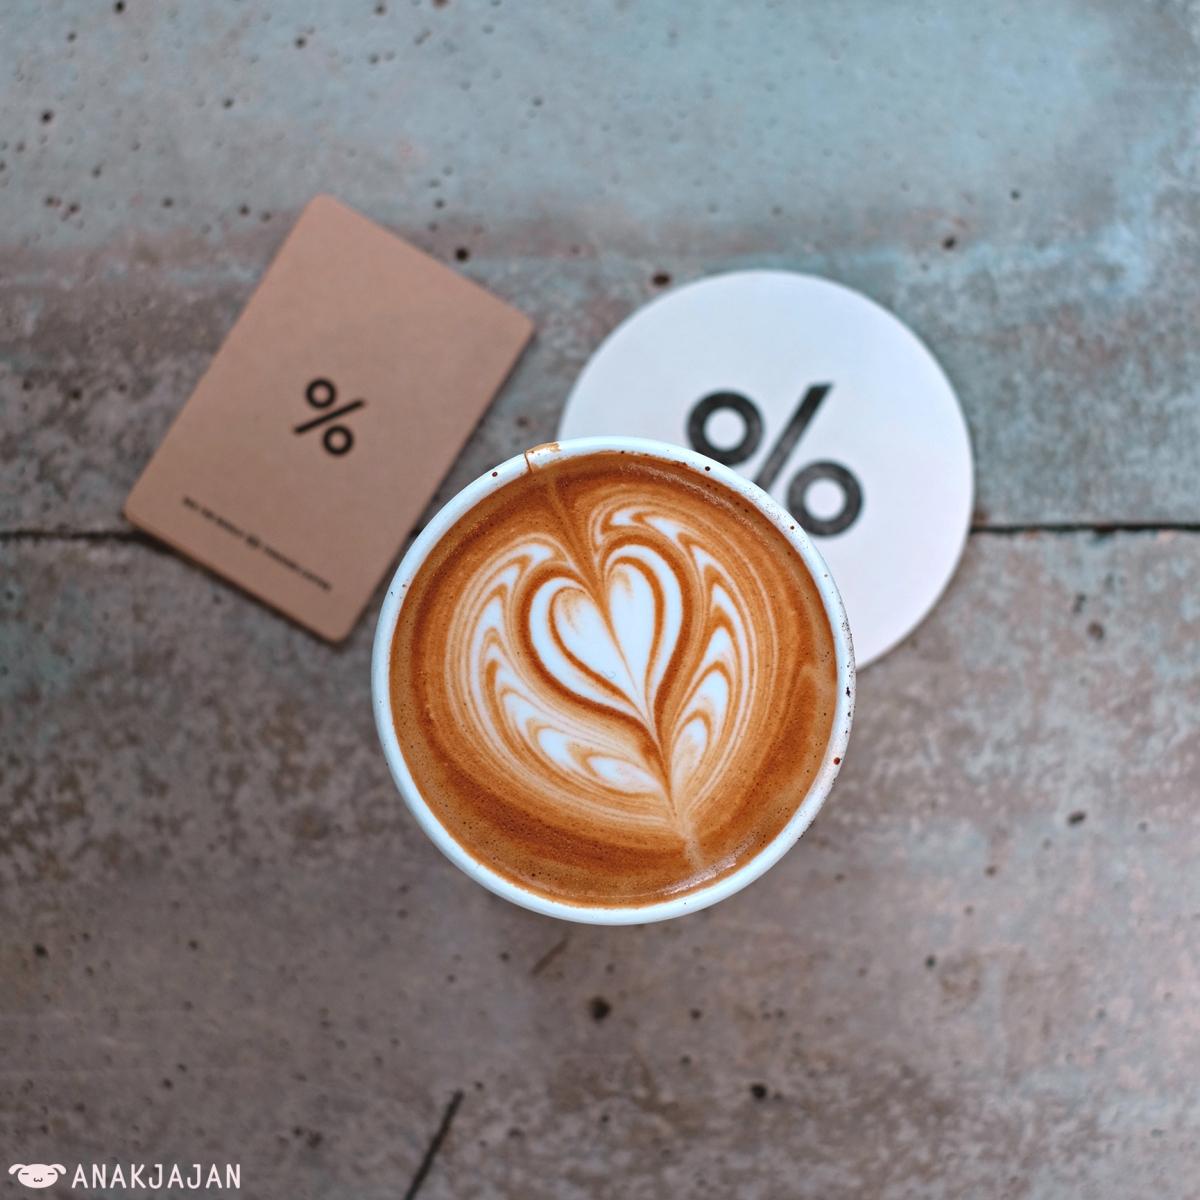 % ARABICA COFFEE